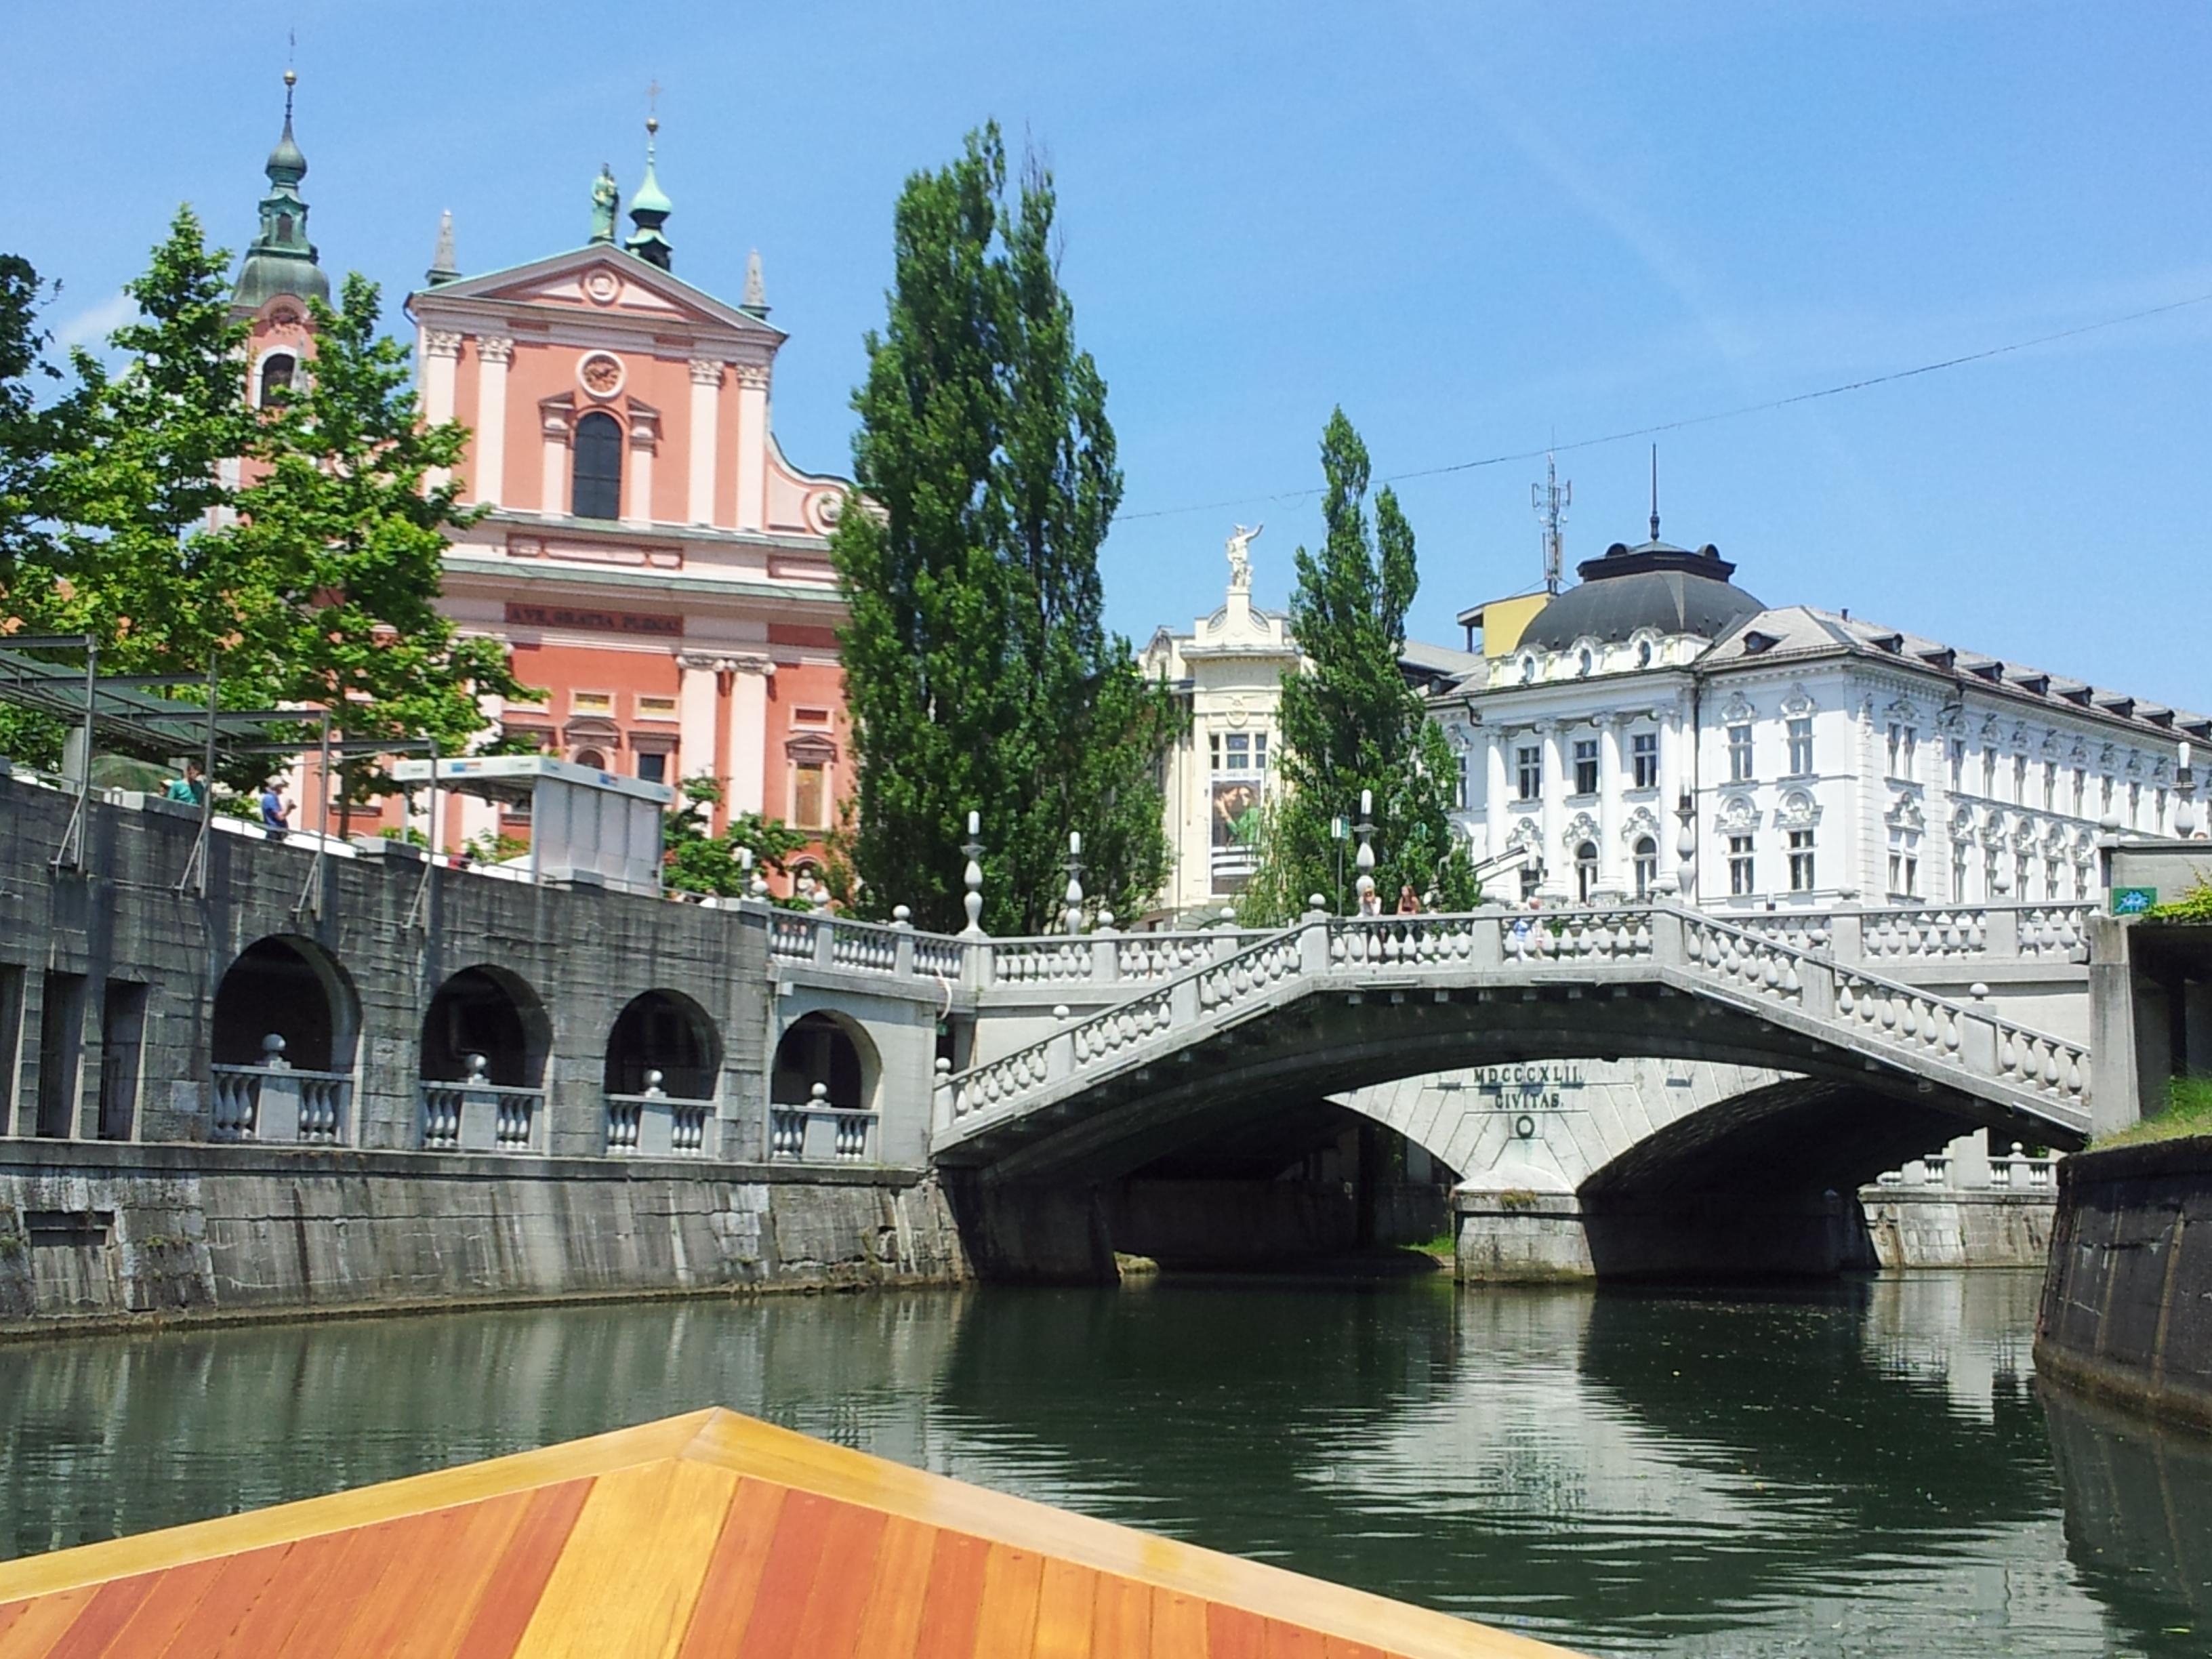 Riverbanks and Three Bridges